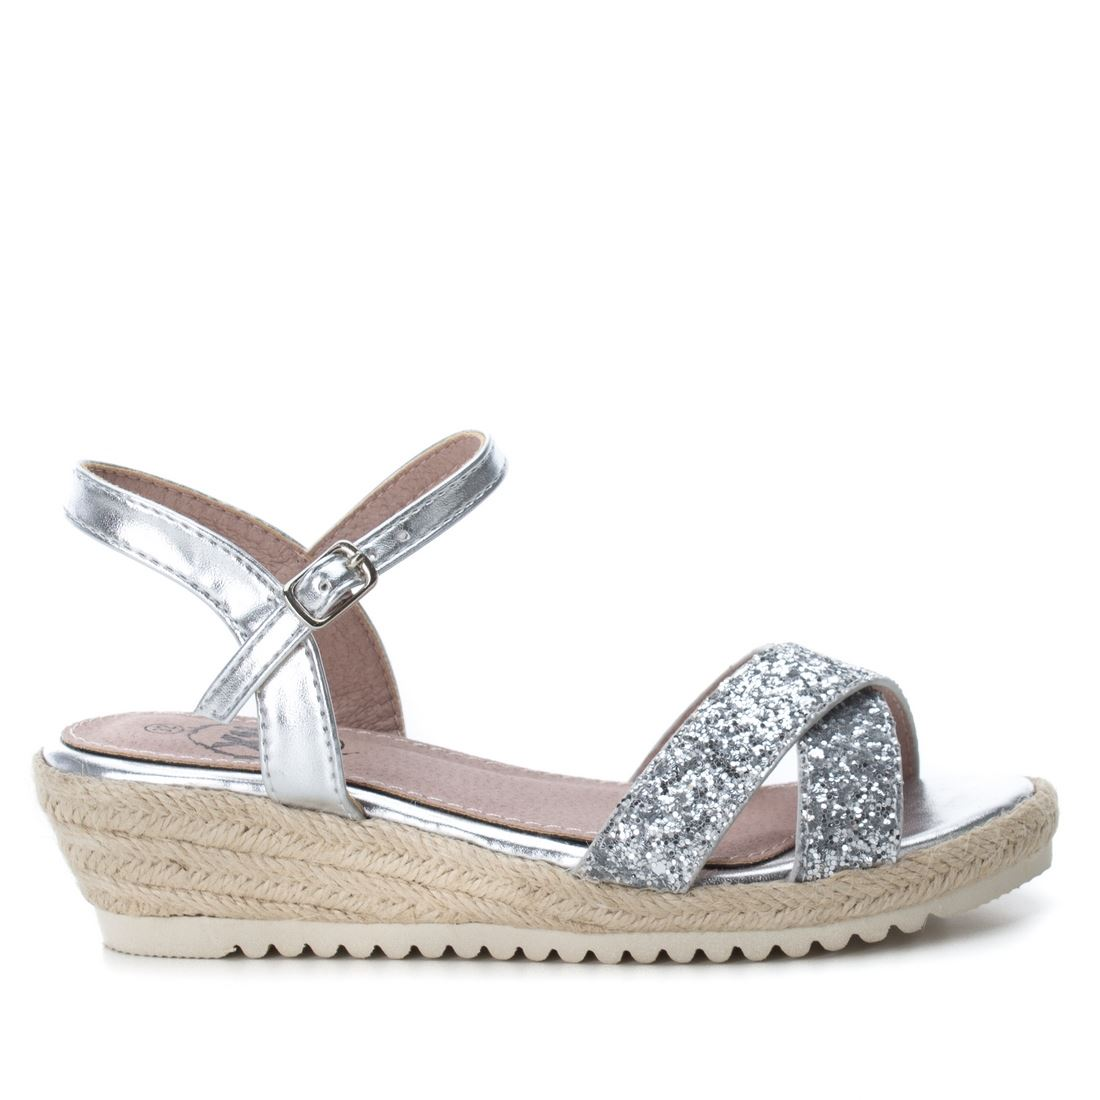 XTI Platform sandals - silver